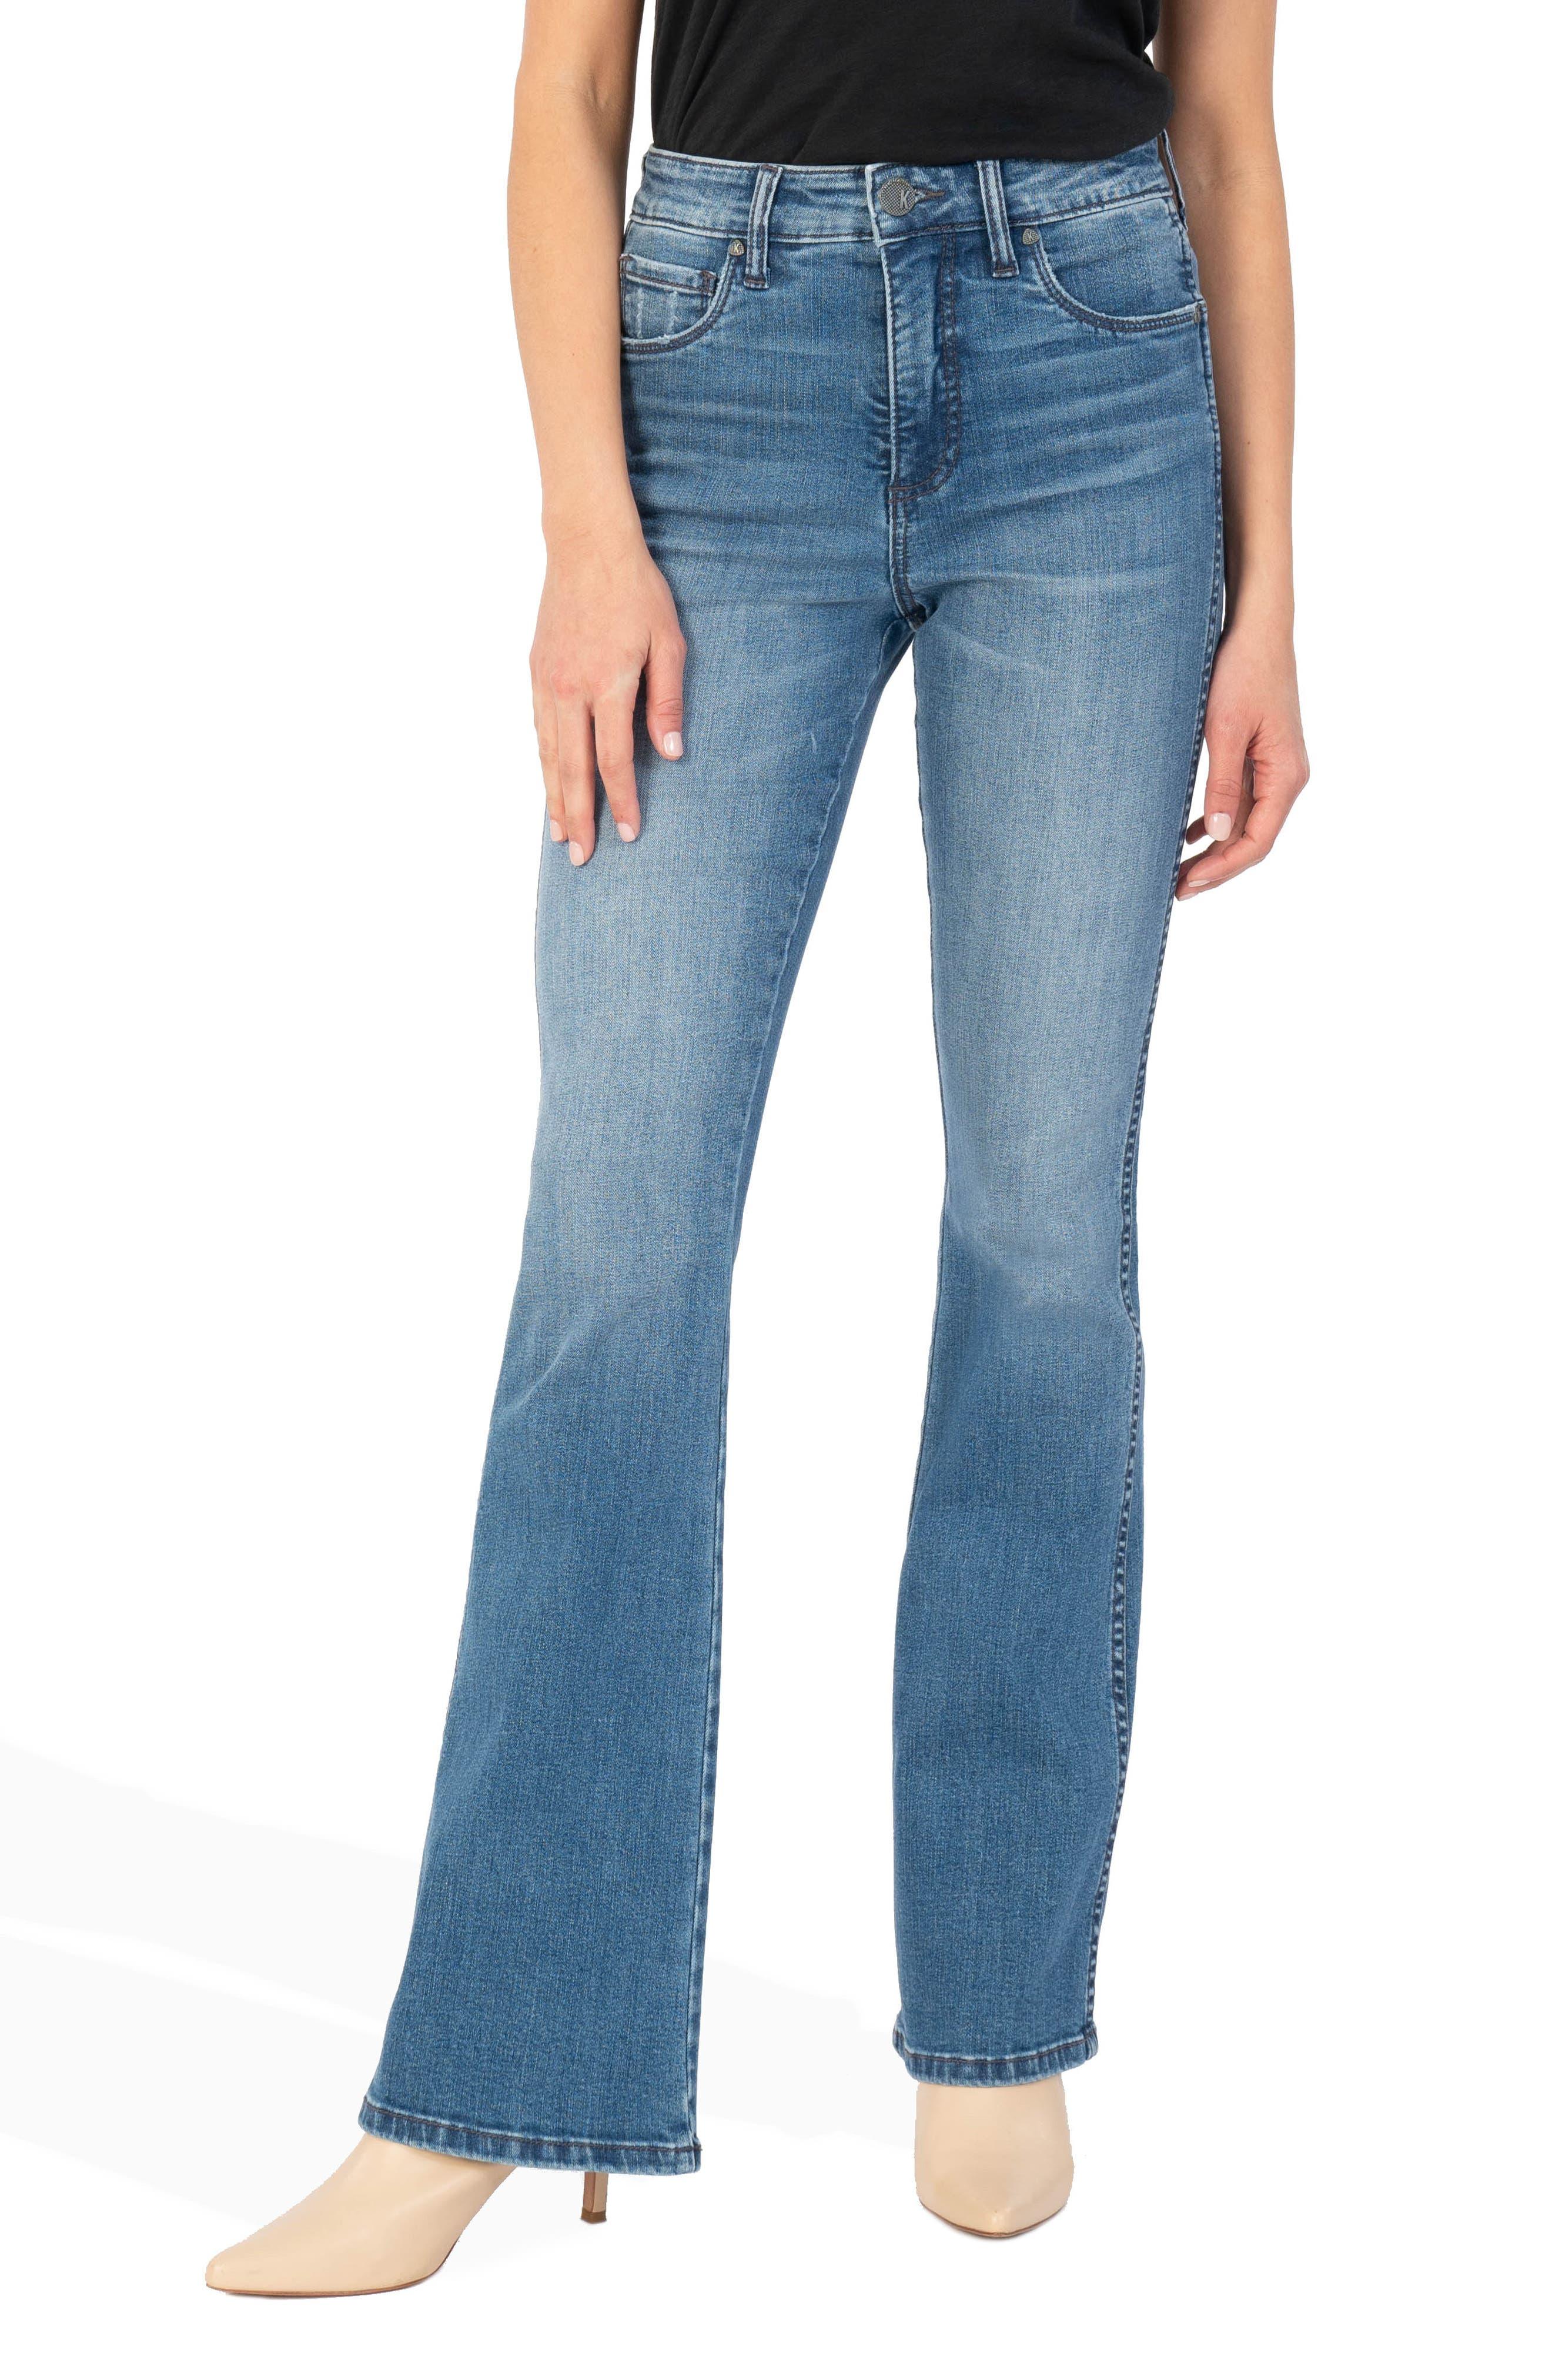 Ana Fab Ab High Waist Flare Jeans